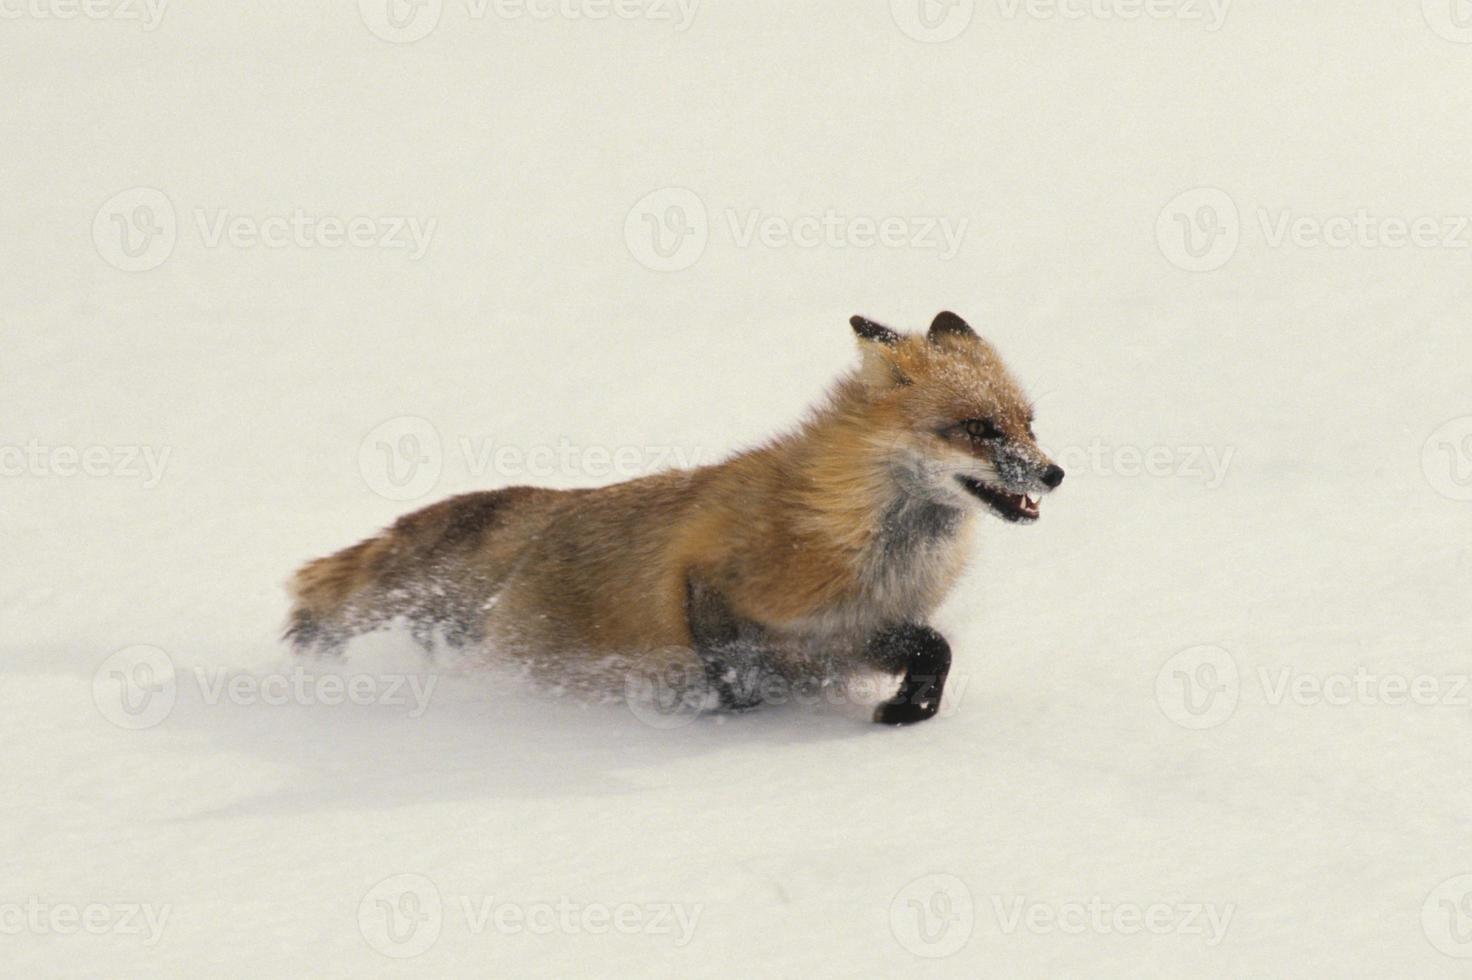 raposa vermelha correndo na neve foto